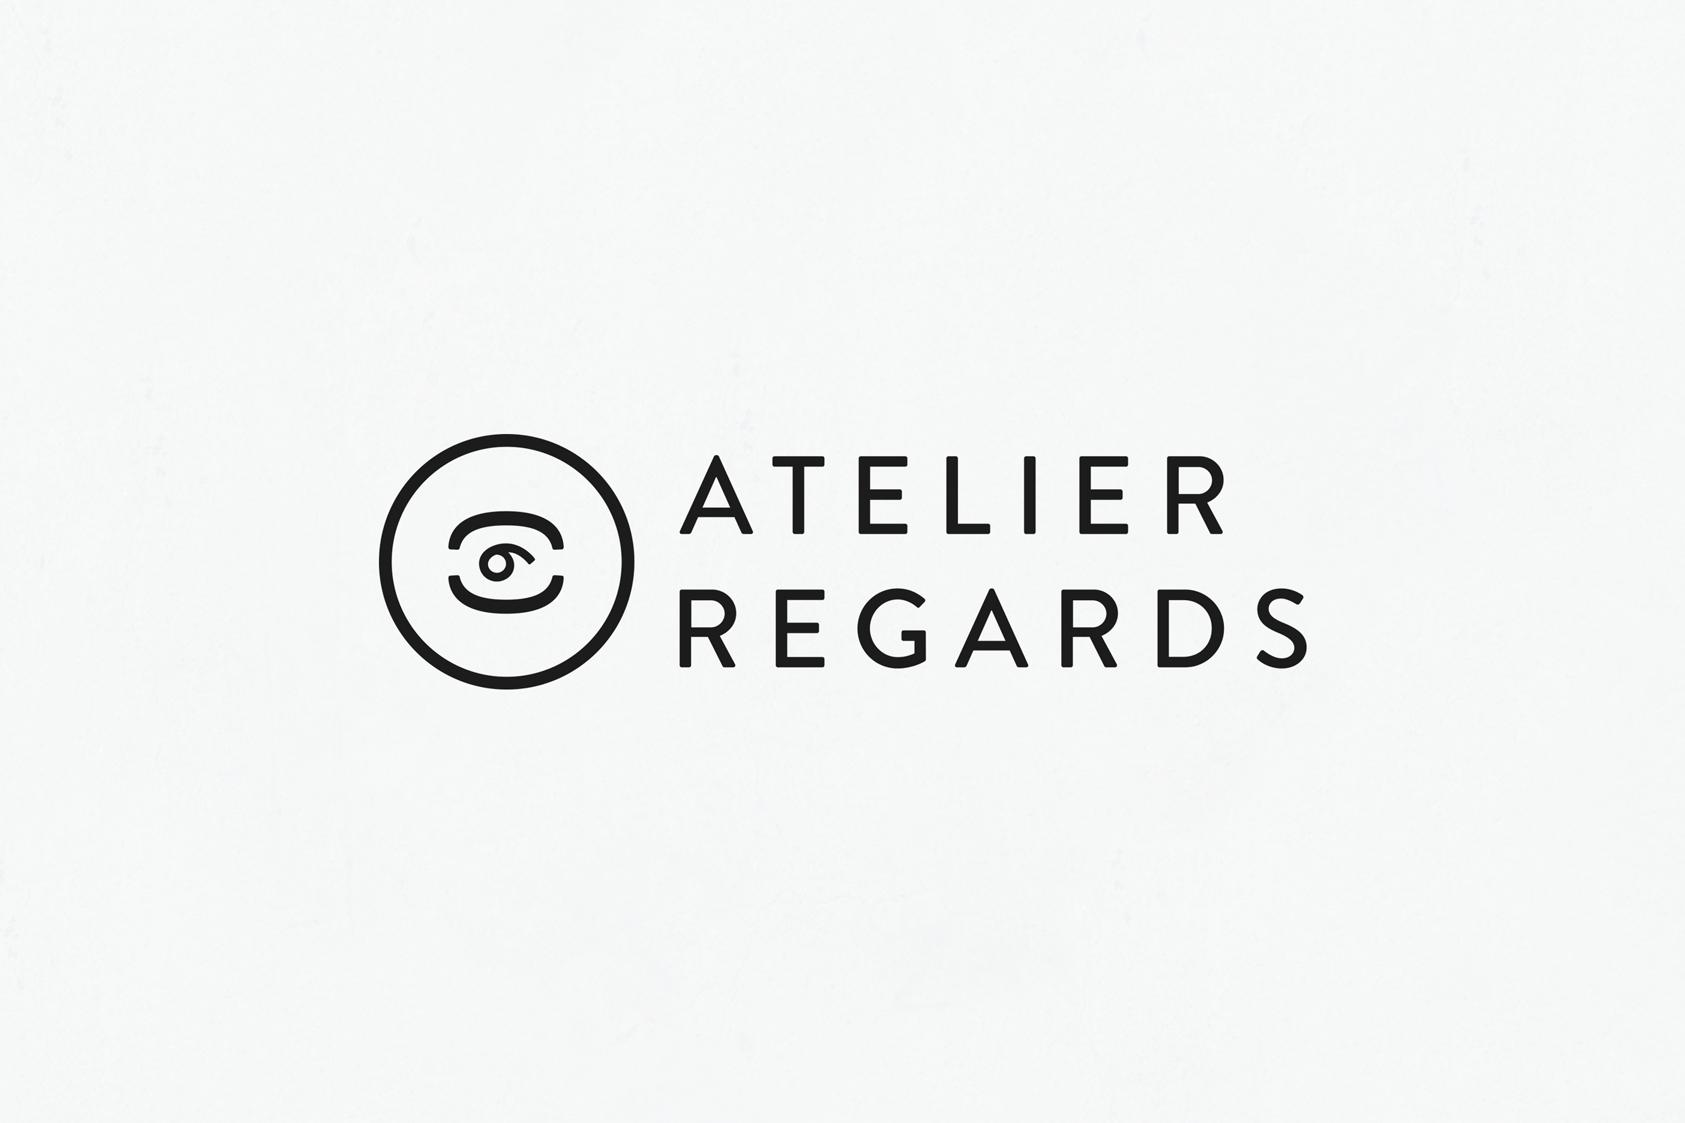 ATELIER REGARDS